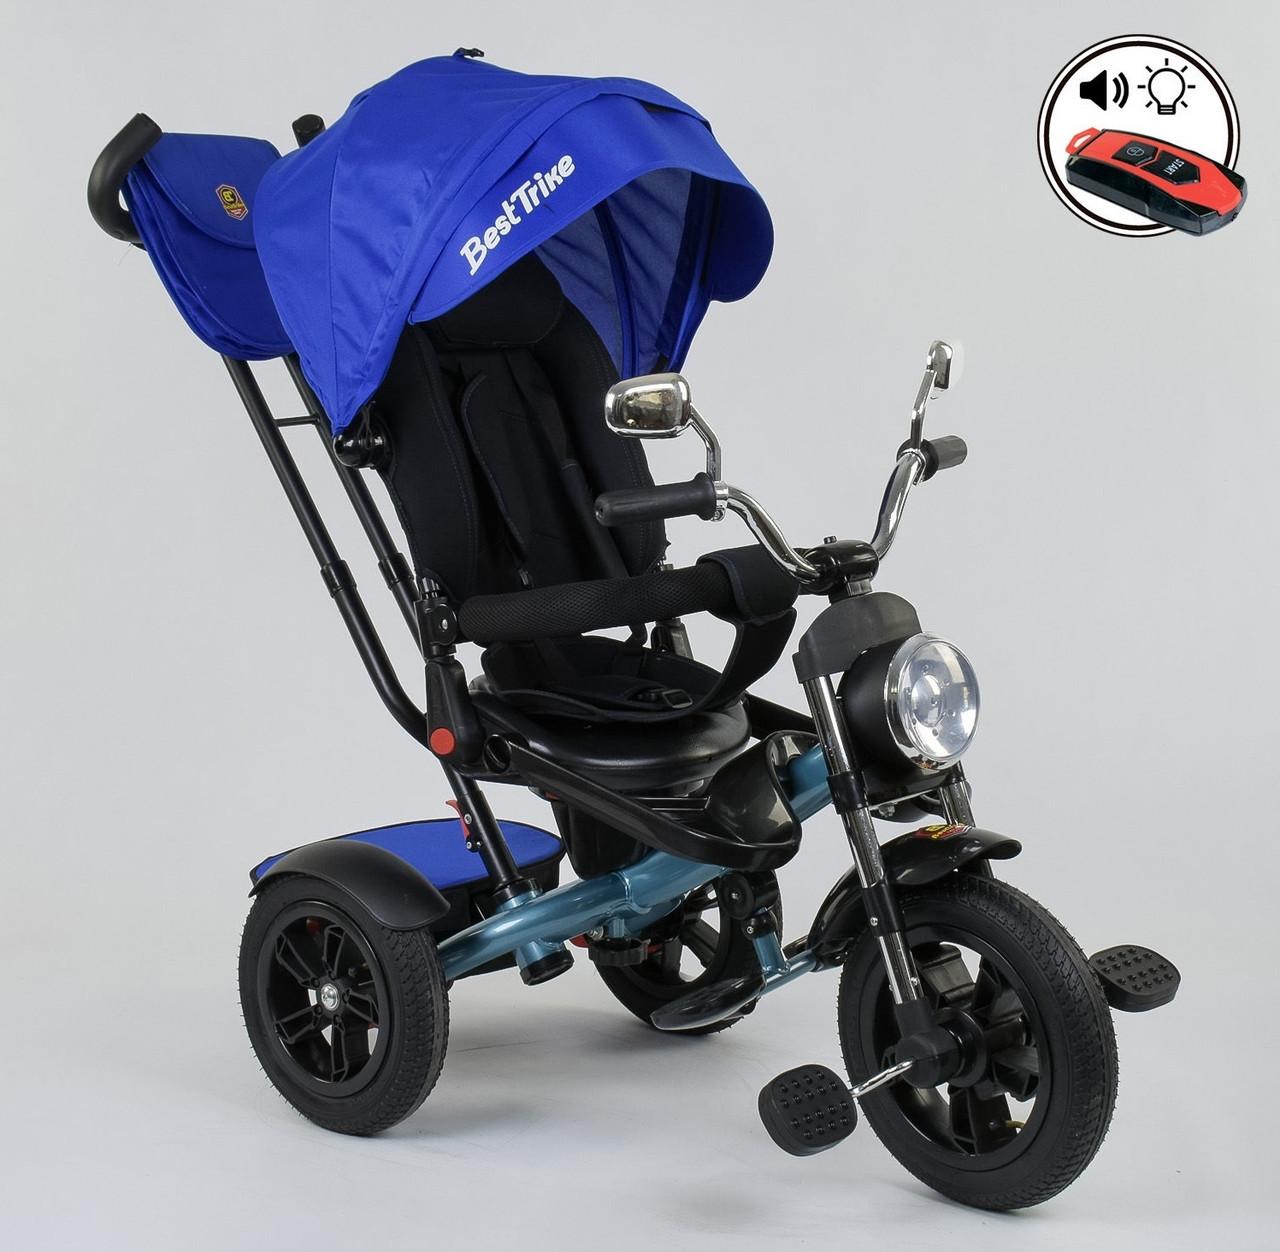 Best Trike Велосипед Best Trike 4490 - 2761 Blue / Turquoise (4490)